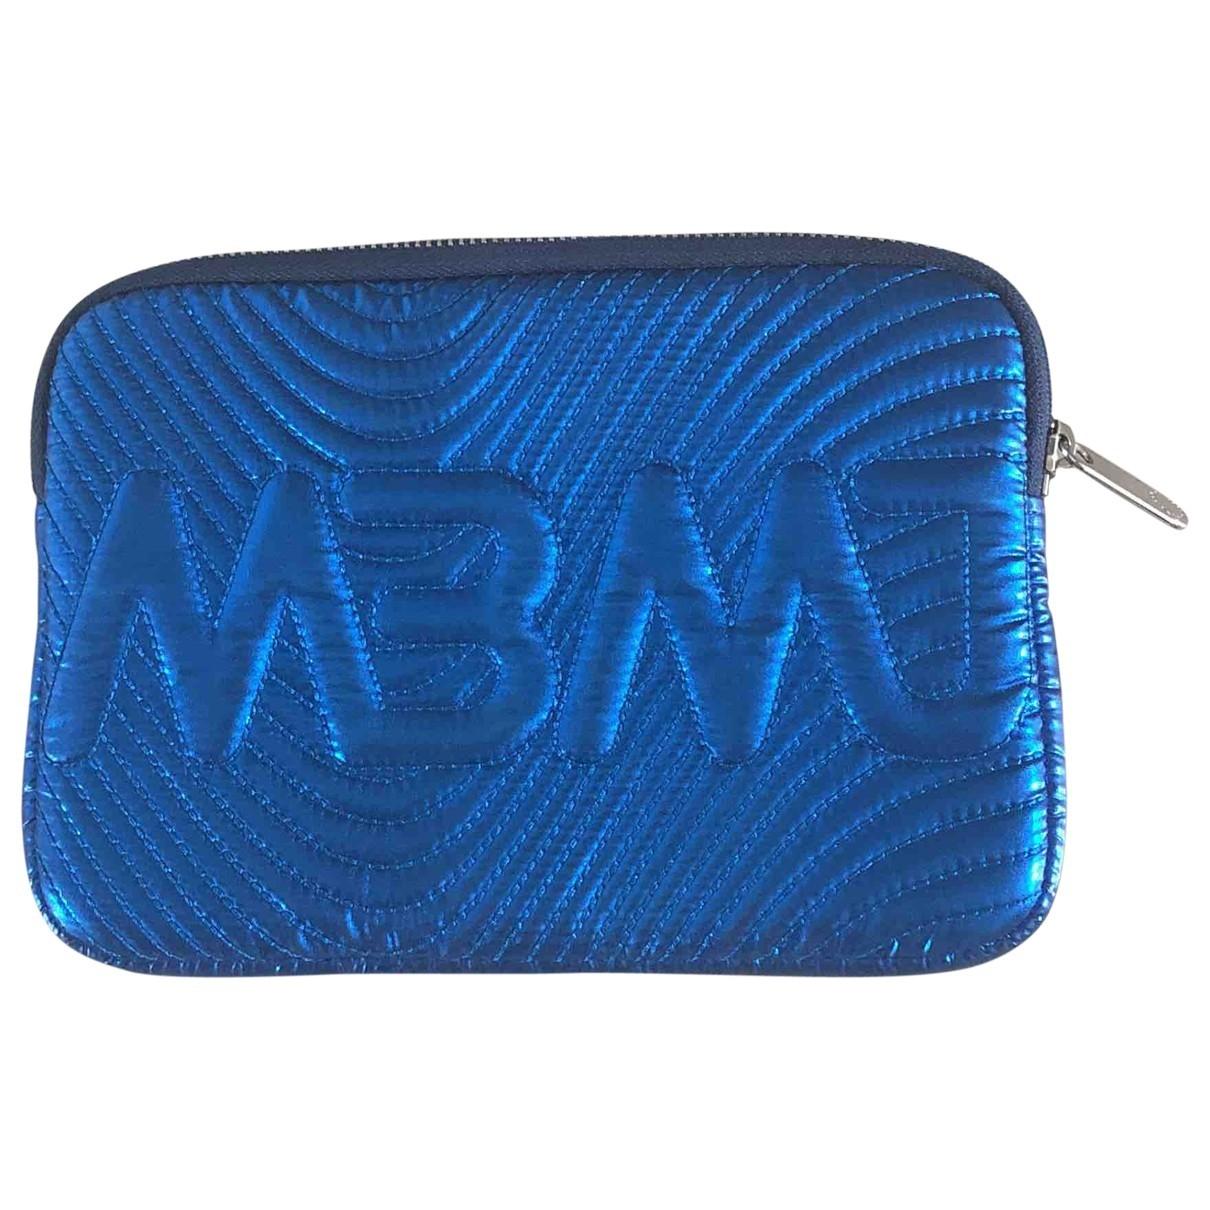 Marc By Marc Jacobs \N Blue Clutch bag for Women \N